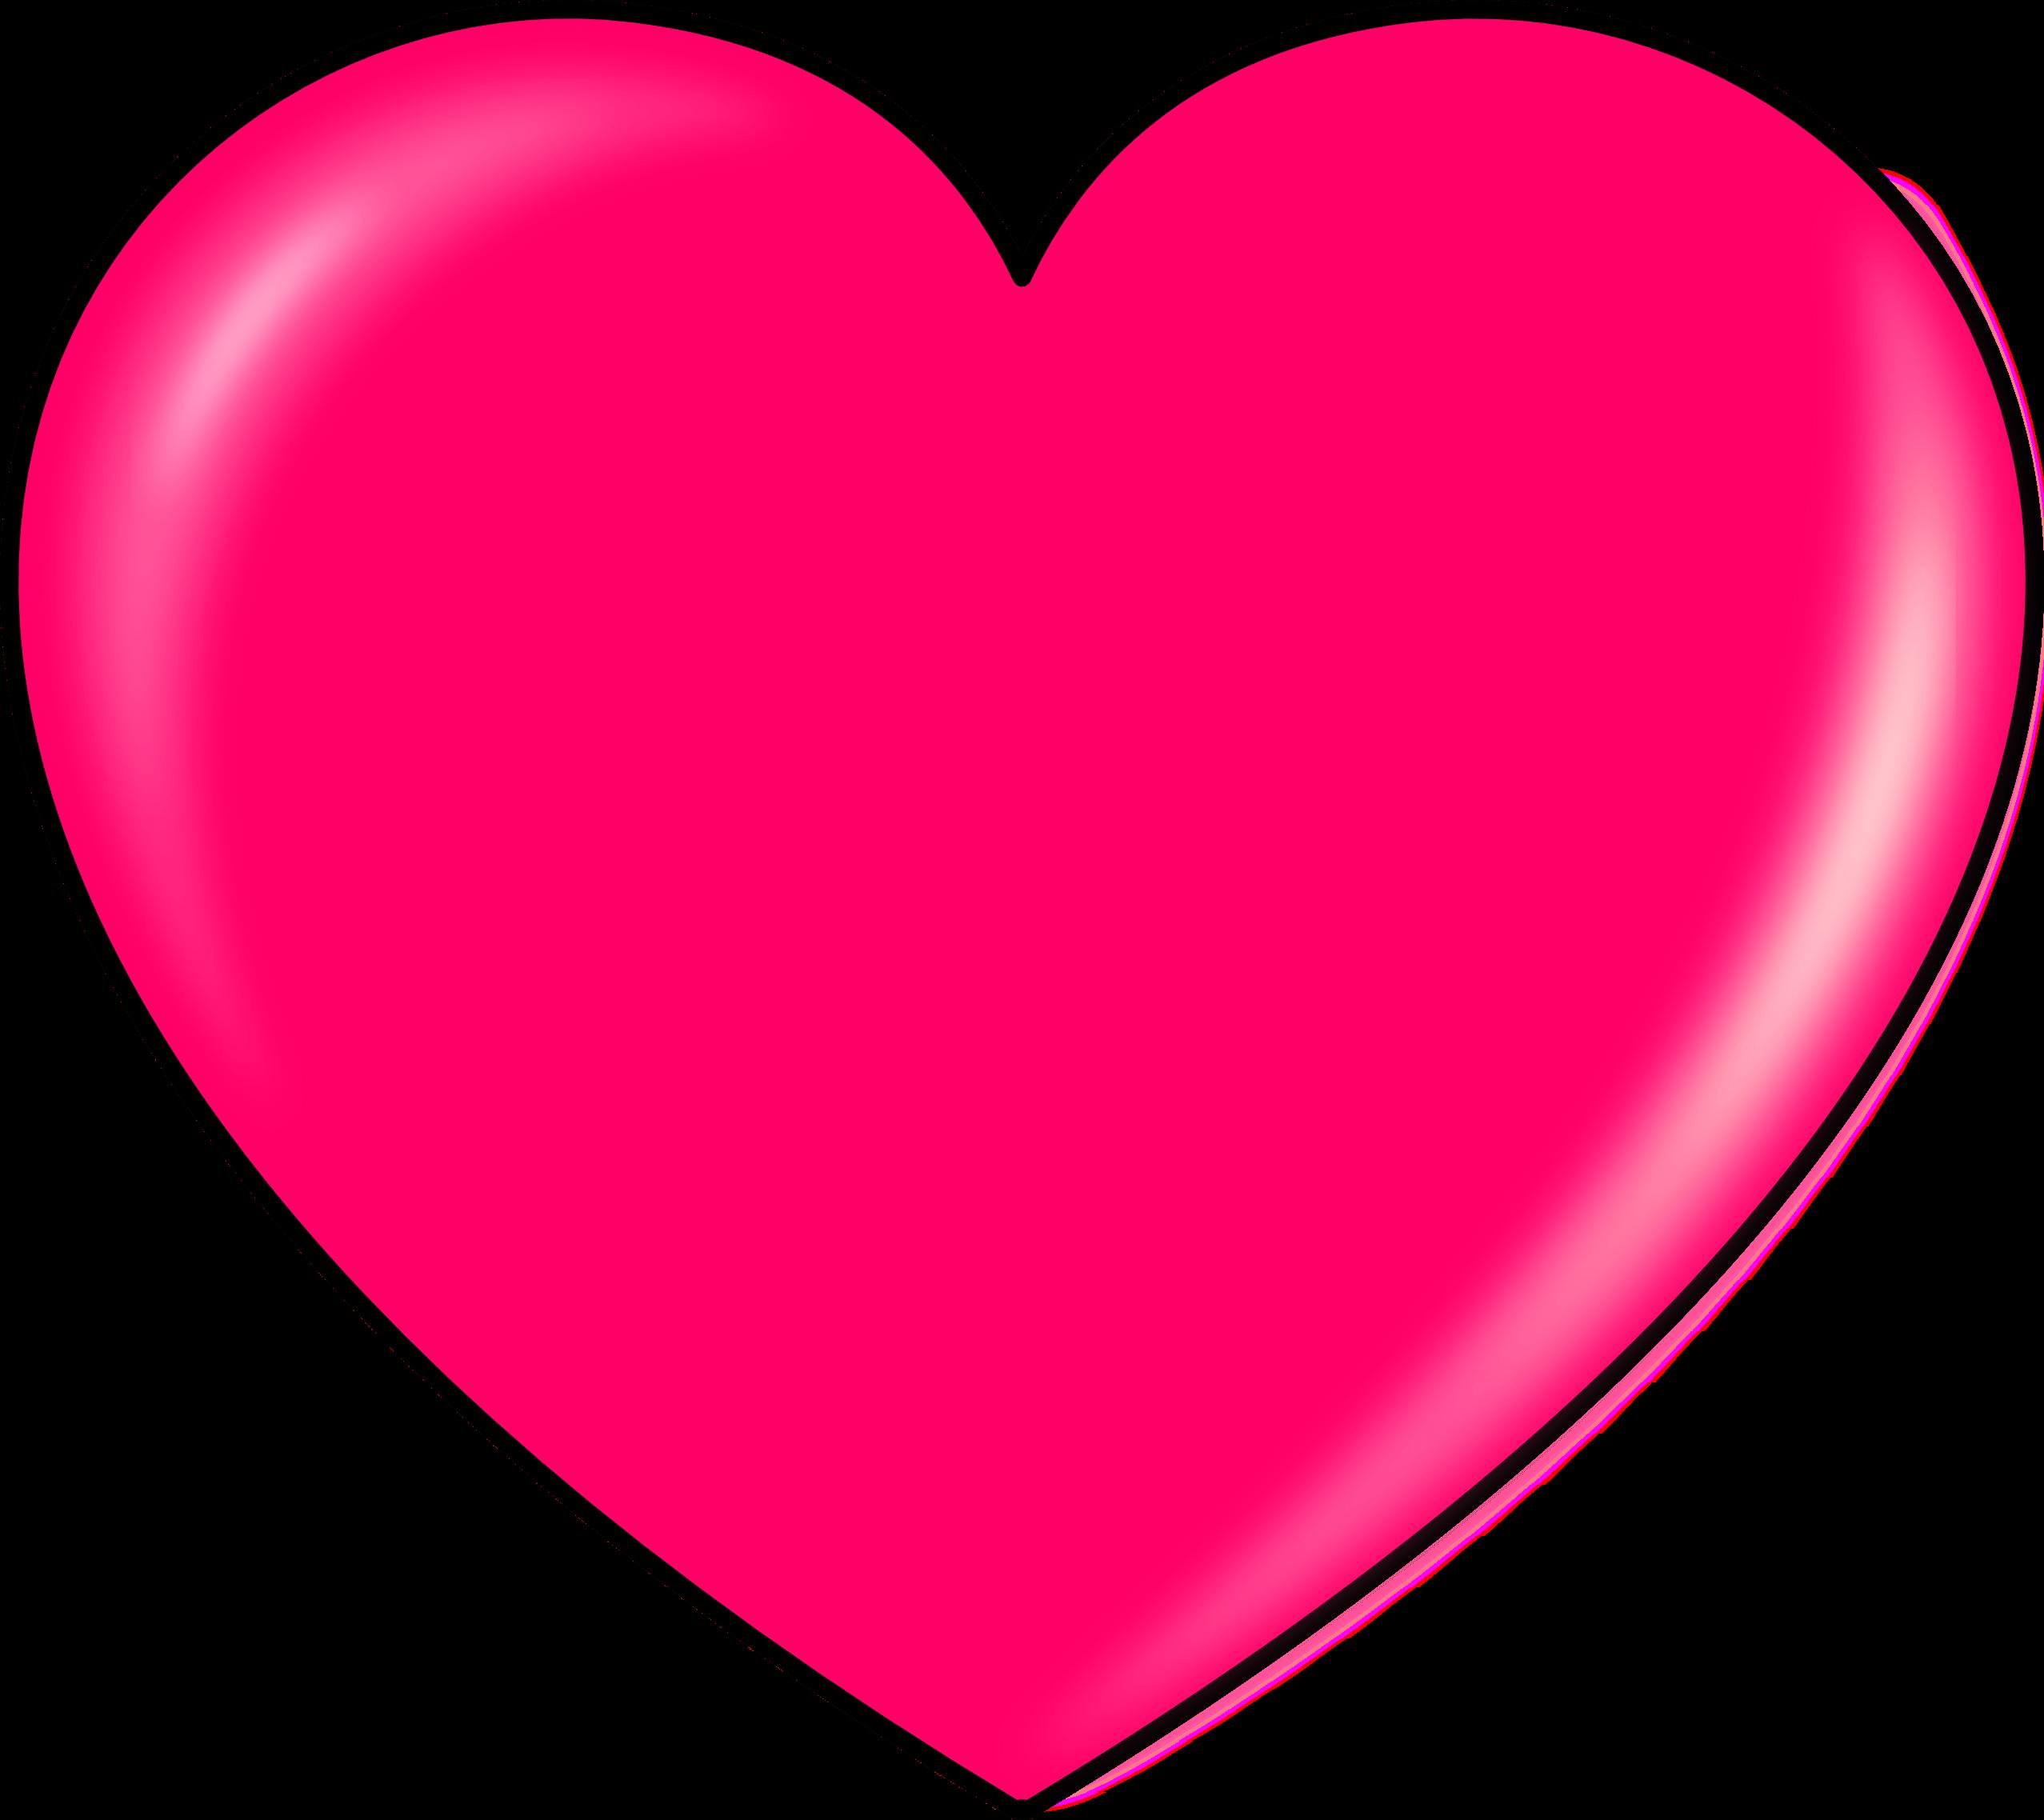 Pink Heart Clipart transparent PNG.